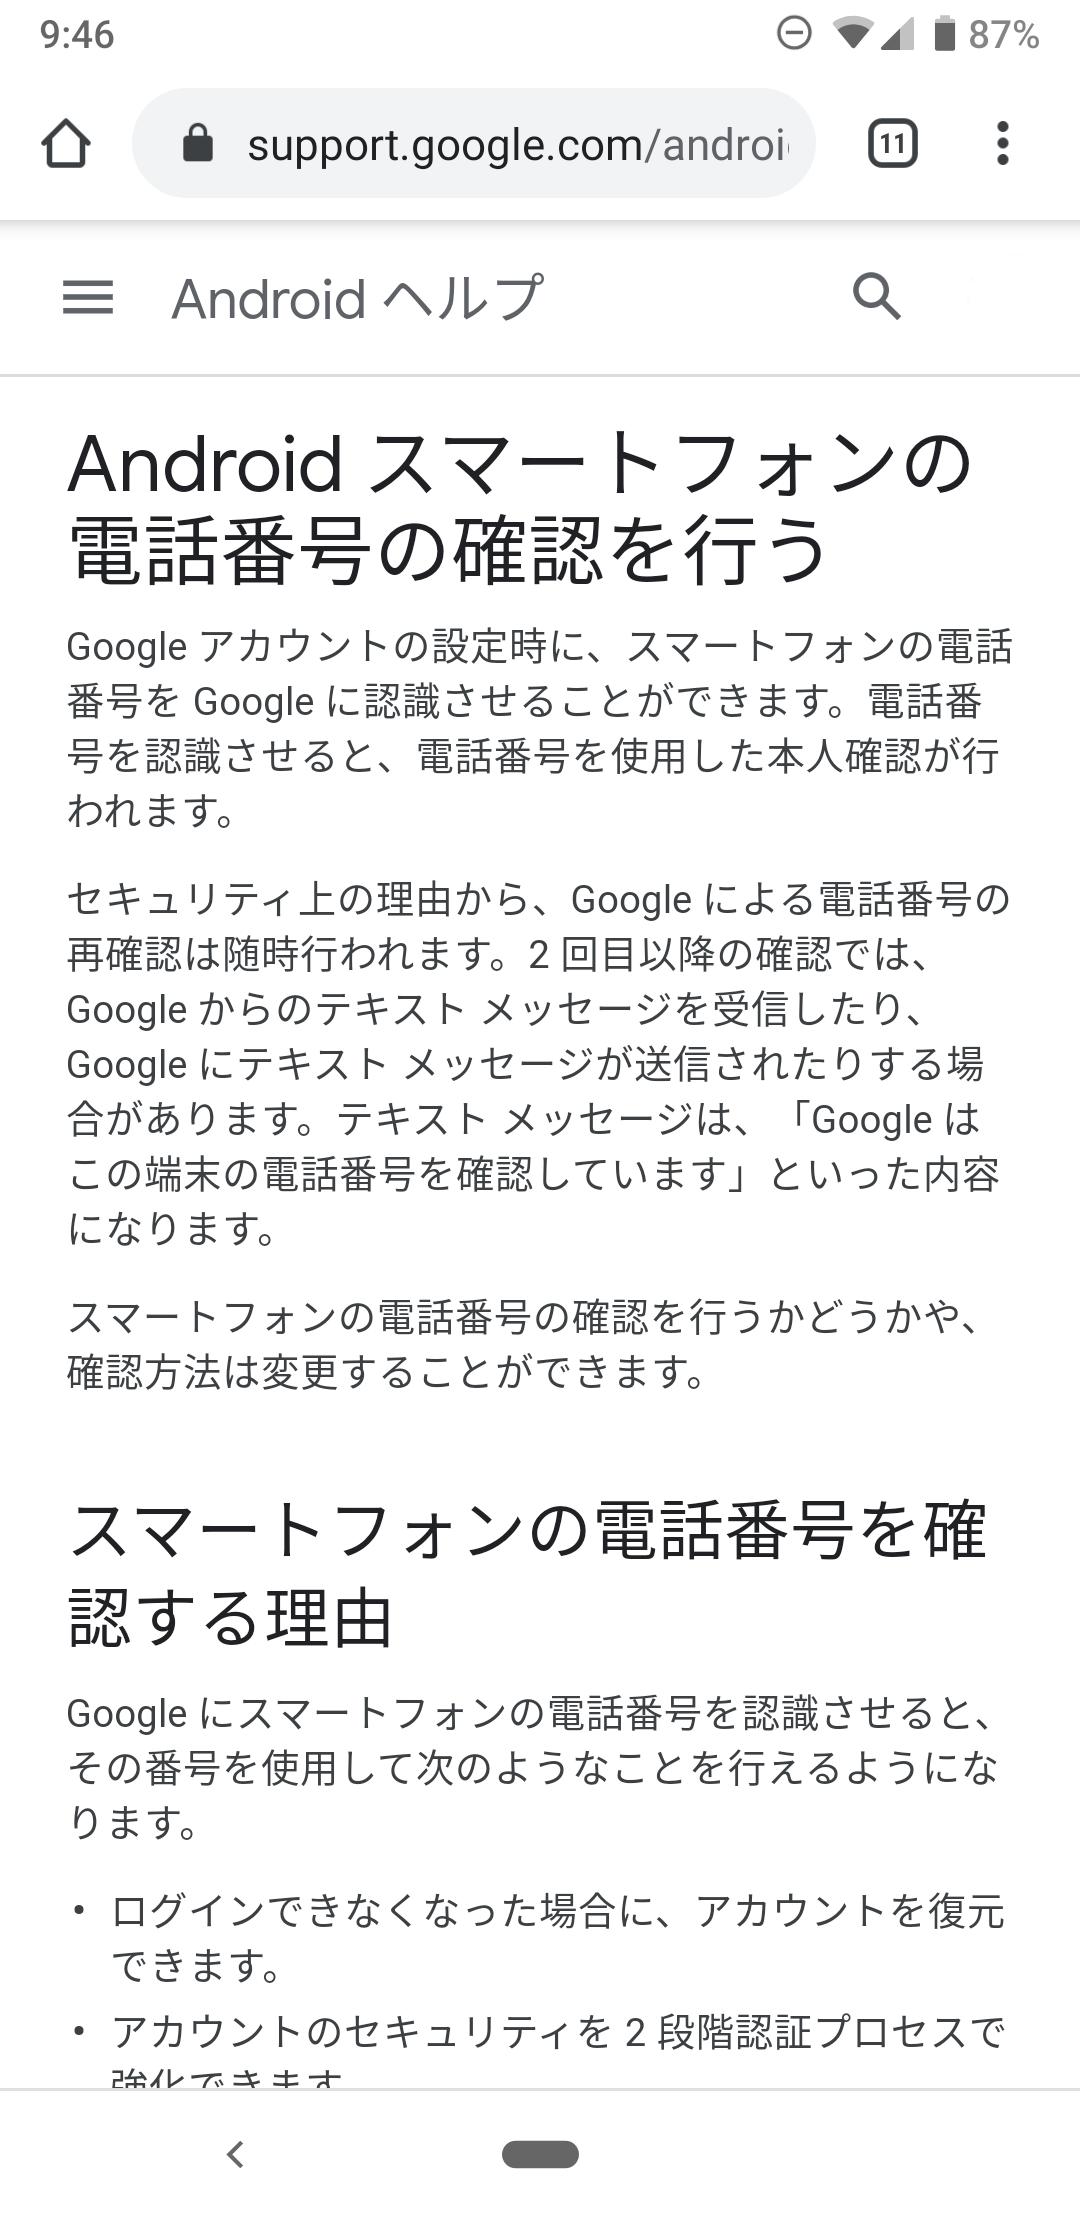 Android スマートフォンの電話番号の確認を行う